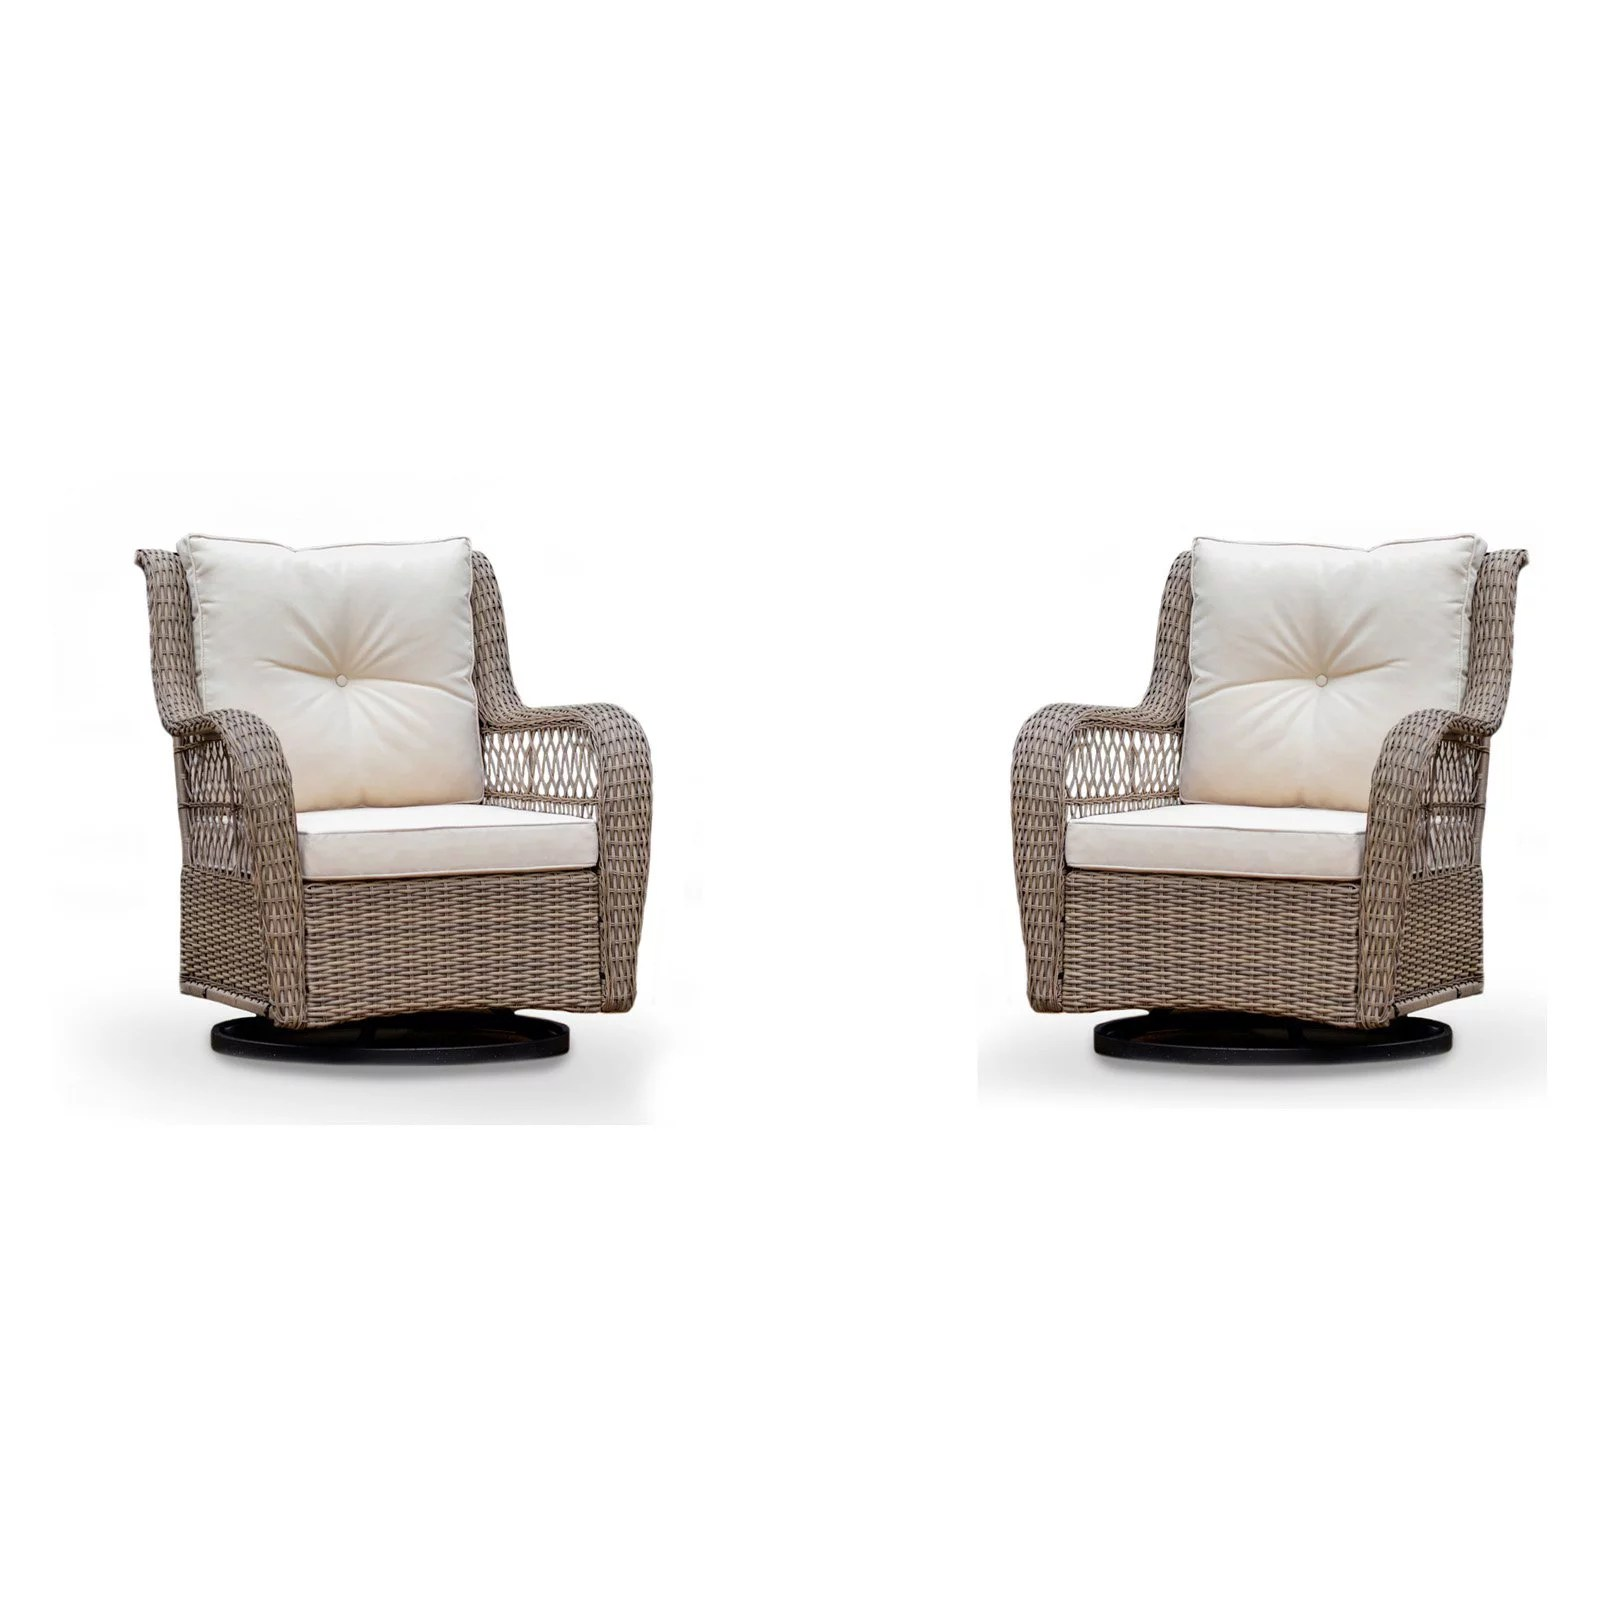 tortuga outdoor rio vista all weather resin wicker outdoor glider chair brown beige